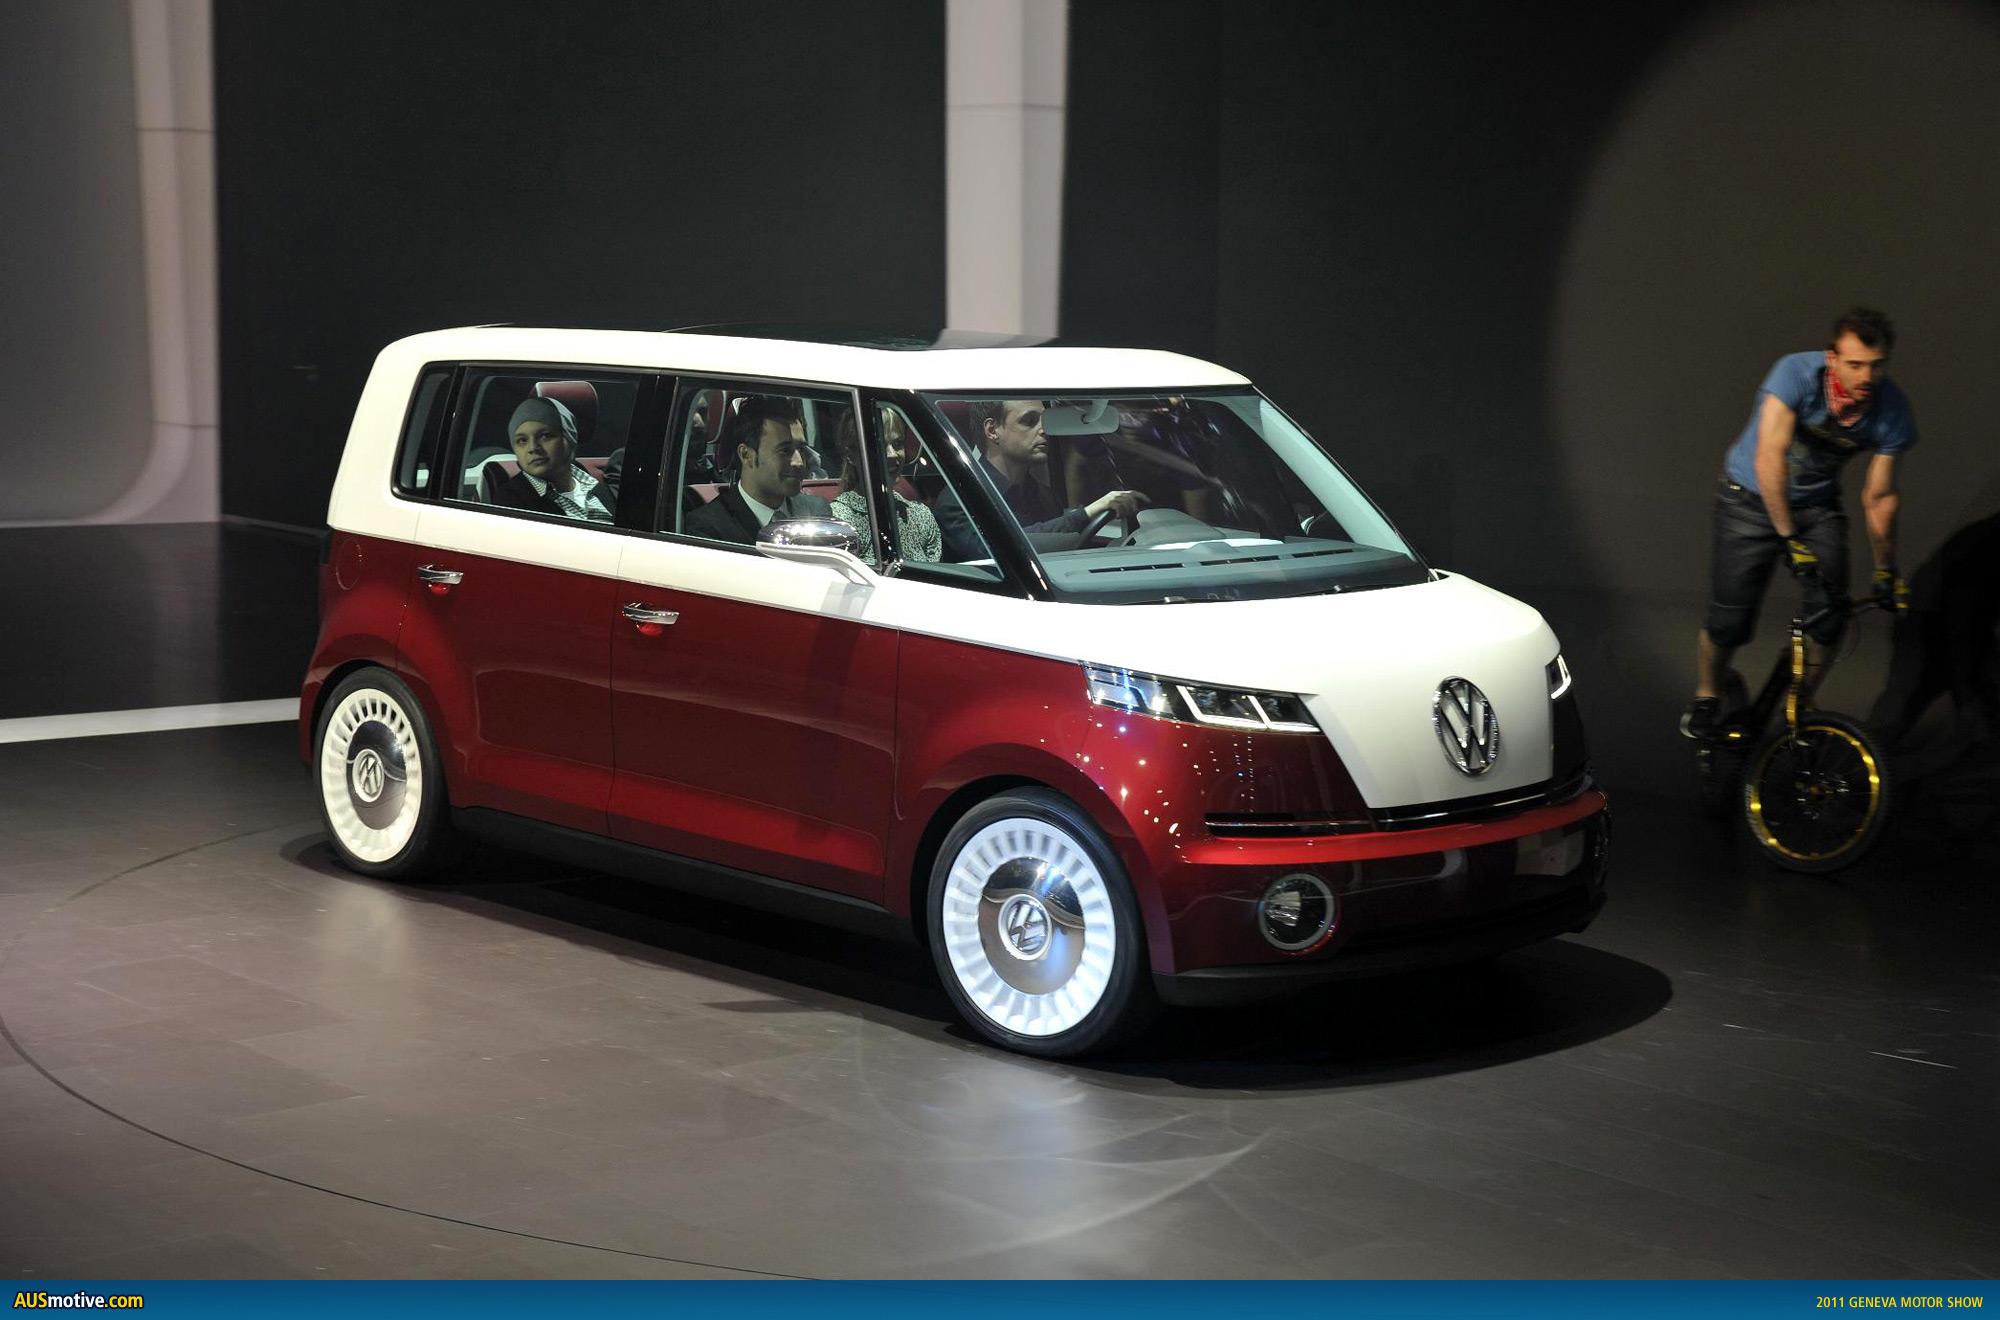 AUSmotive.com » Geneva 2011: Volkswagen Bulli concept